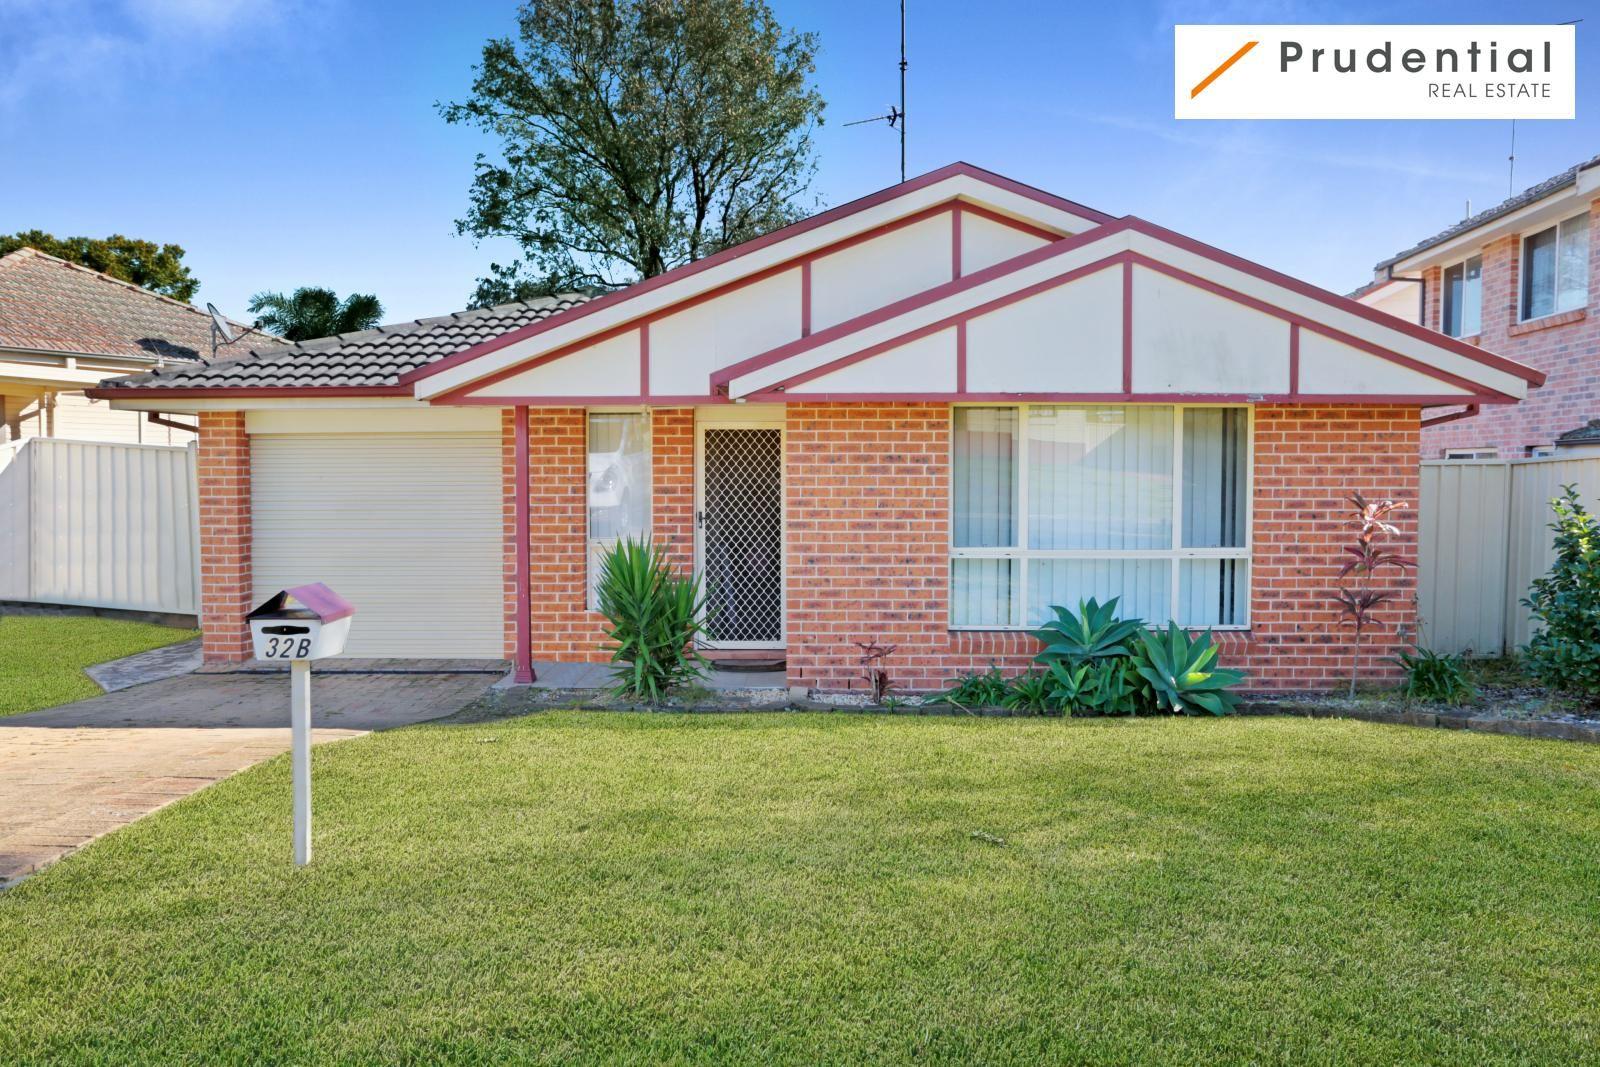 32B High Street, Campbelltown NSW 2560, Image 0